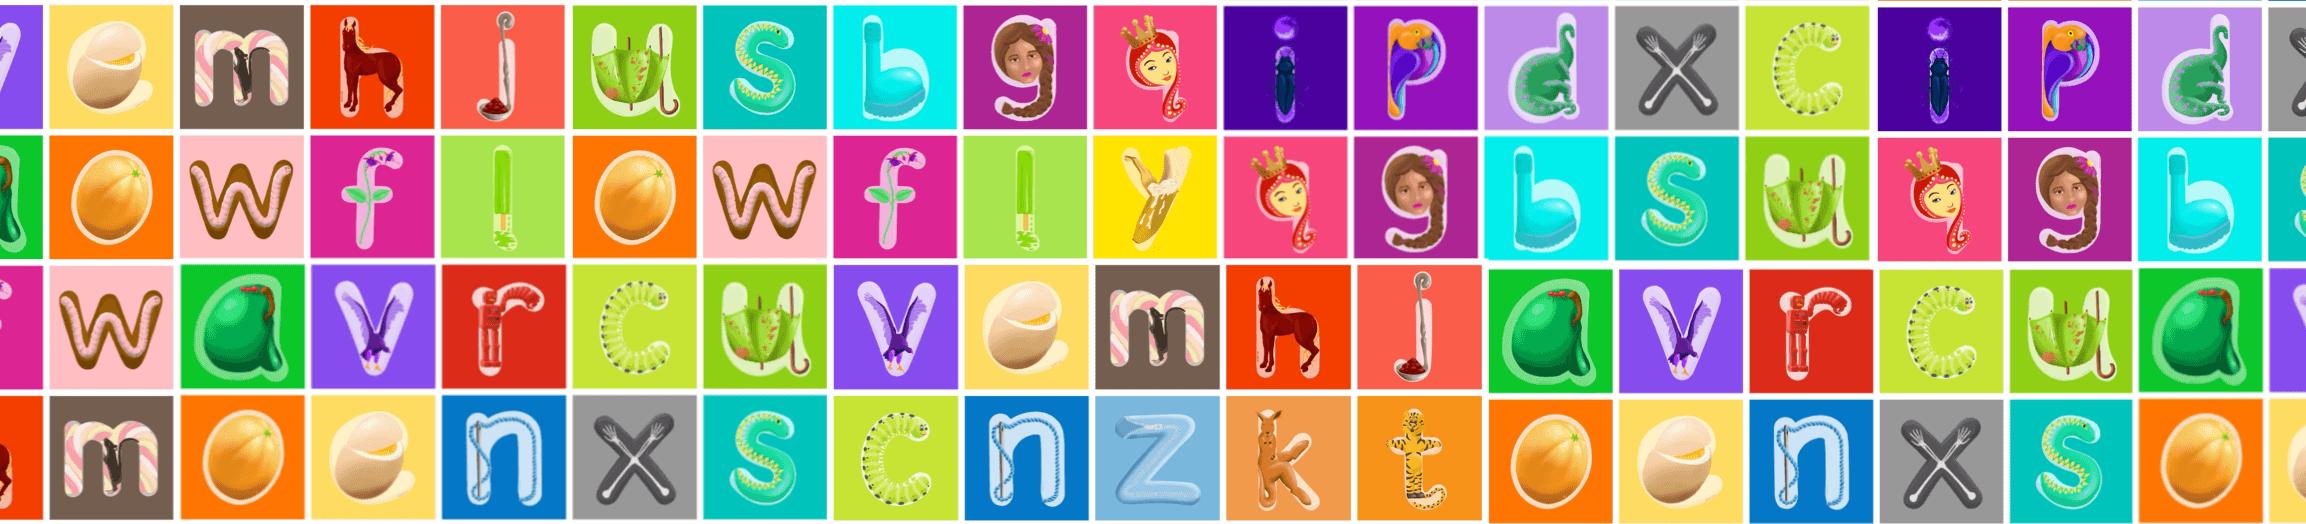 Alphabet Wallpaper Image